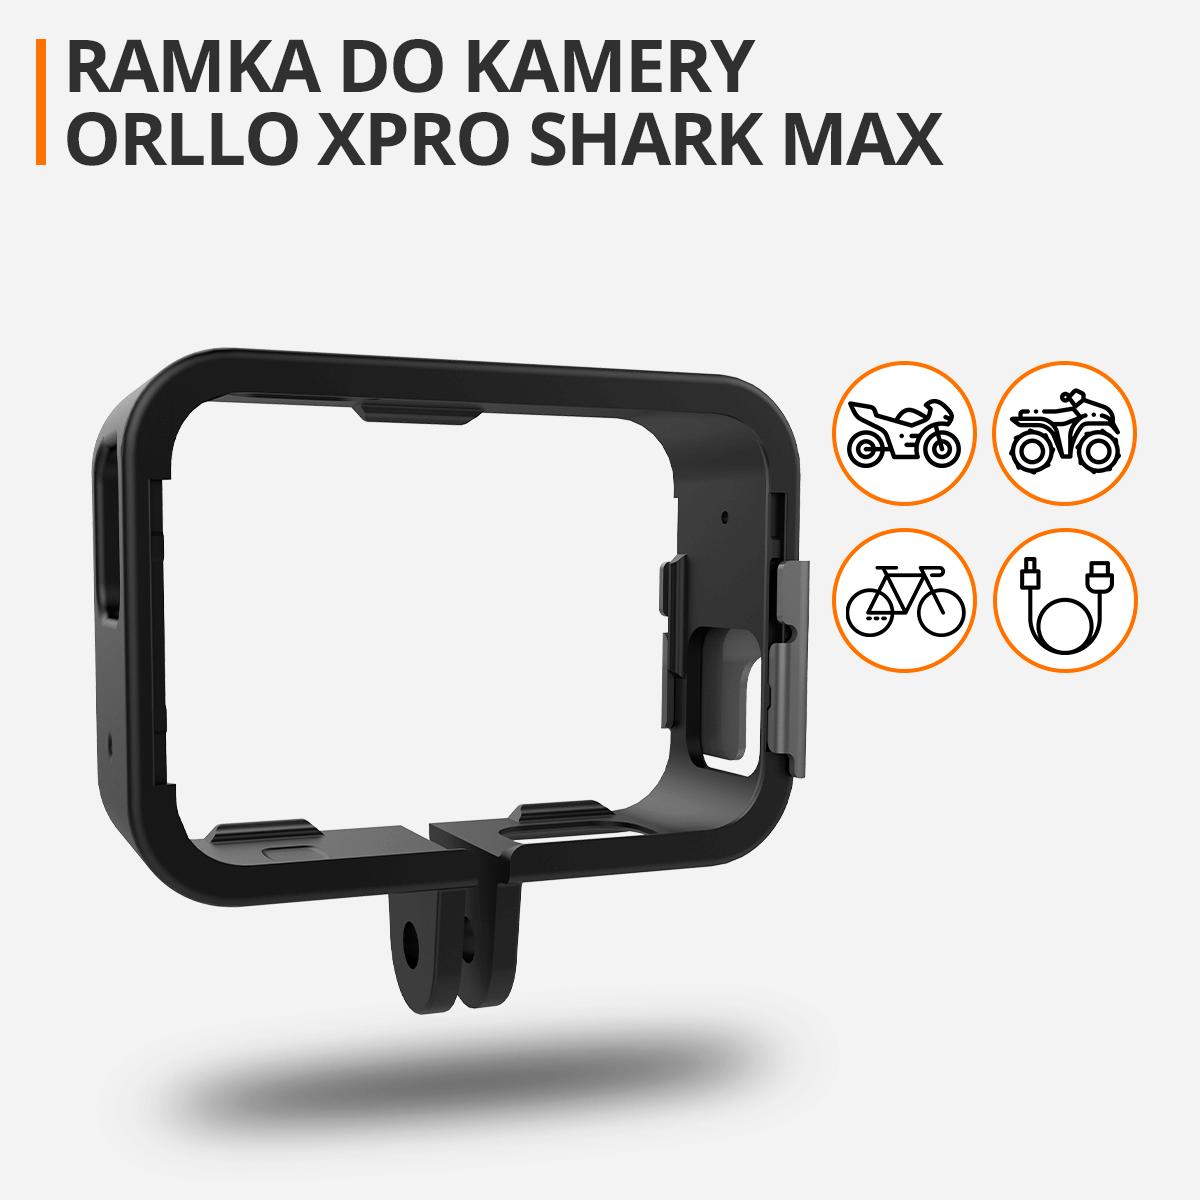 ramka-do-kasku-do-kamery-sportowej-xpro-shark-max-orllo-pl